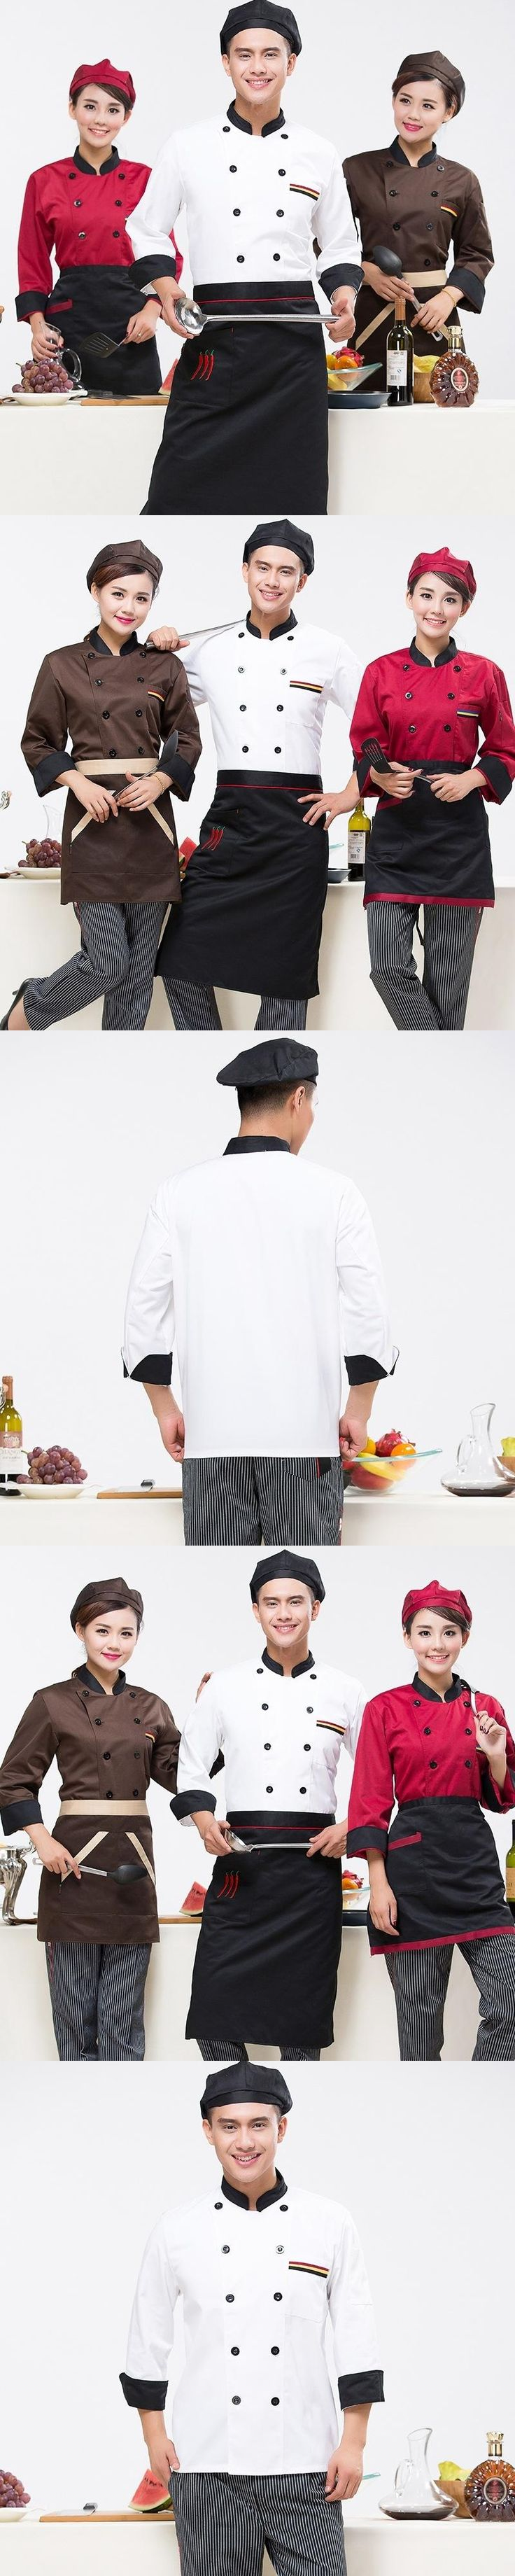 Chef clothing long - sleeved autumn and winter hotel kitchen uniforms restaurant restaurant chef men and women chefs uniforms